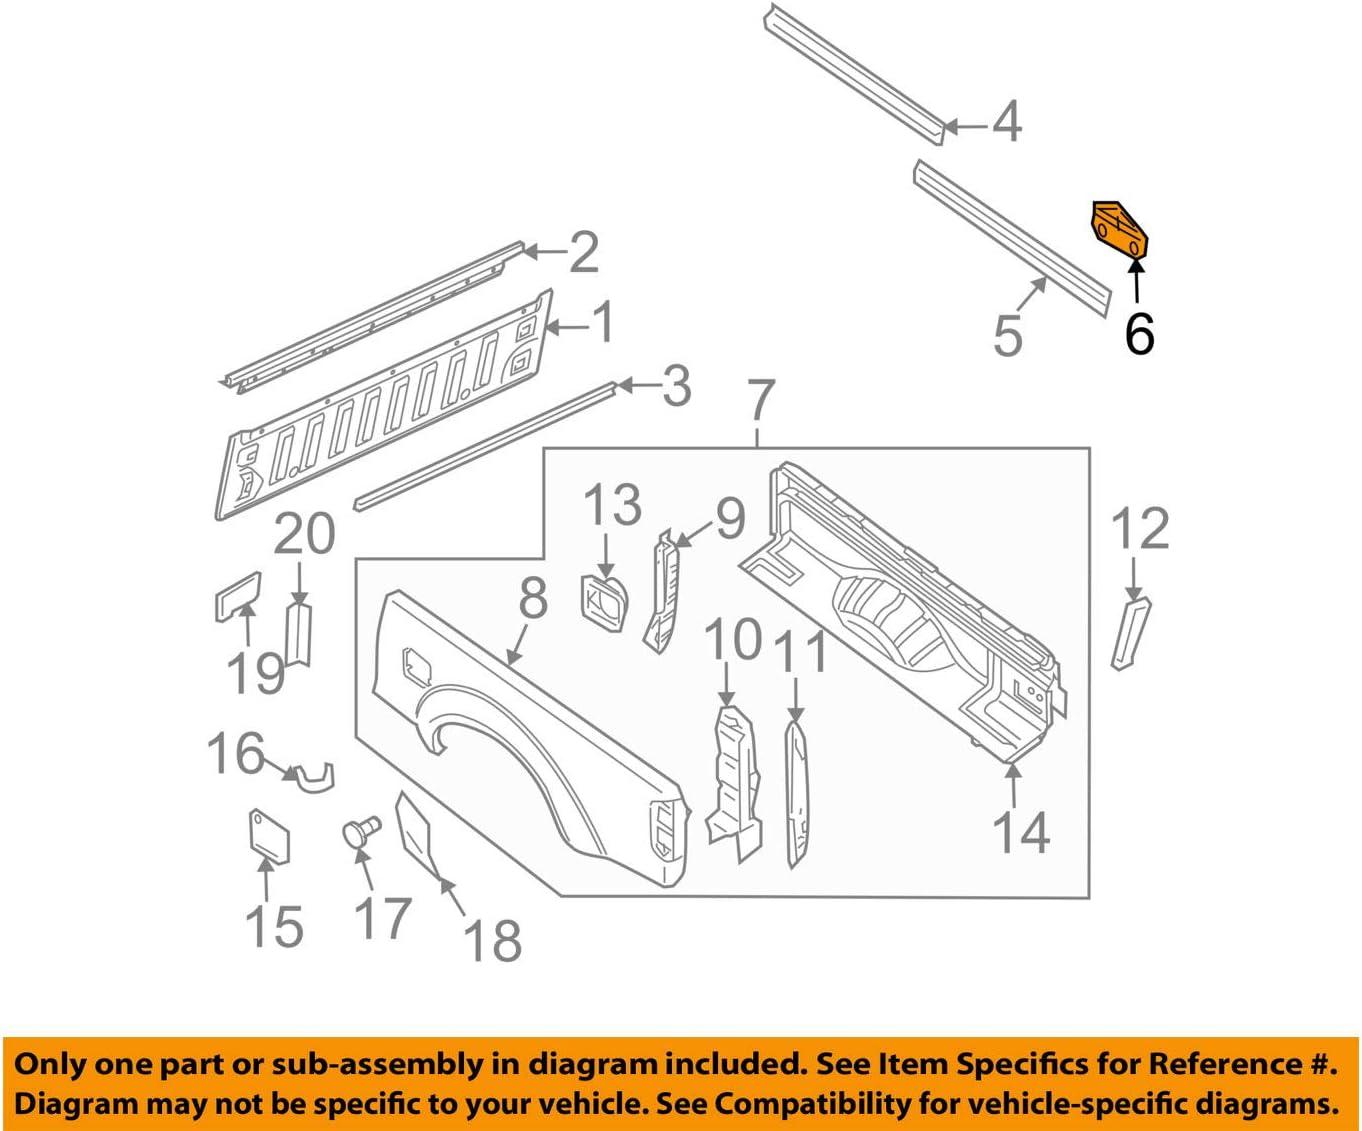 Nissan Hook Rope Tow Hooks Exterior Accessories rbafamilylaw.com